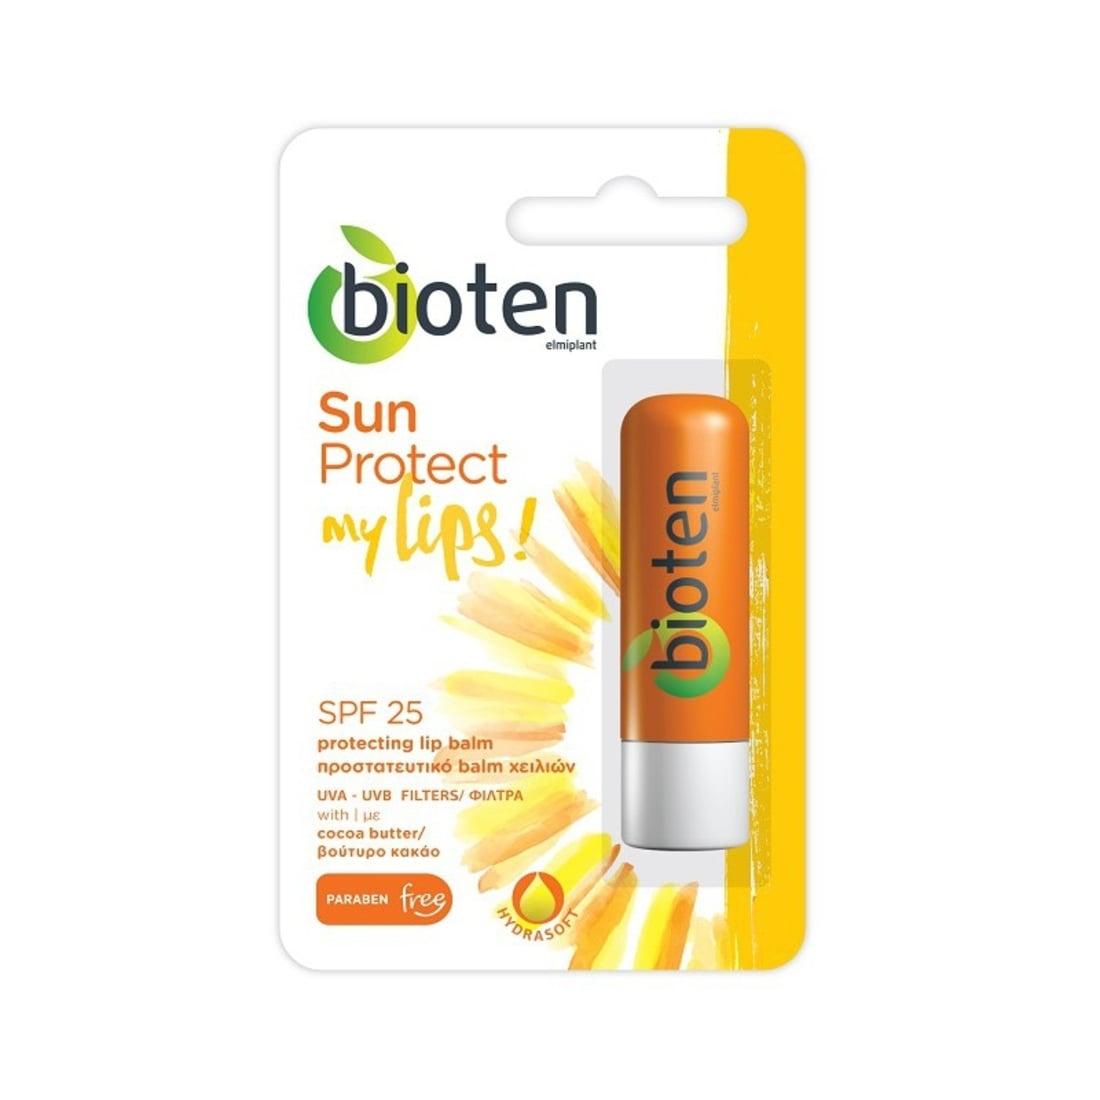 Bioten Lip Sun Protect Spf25 4,8g